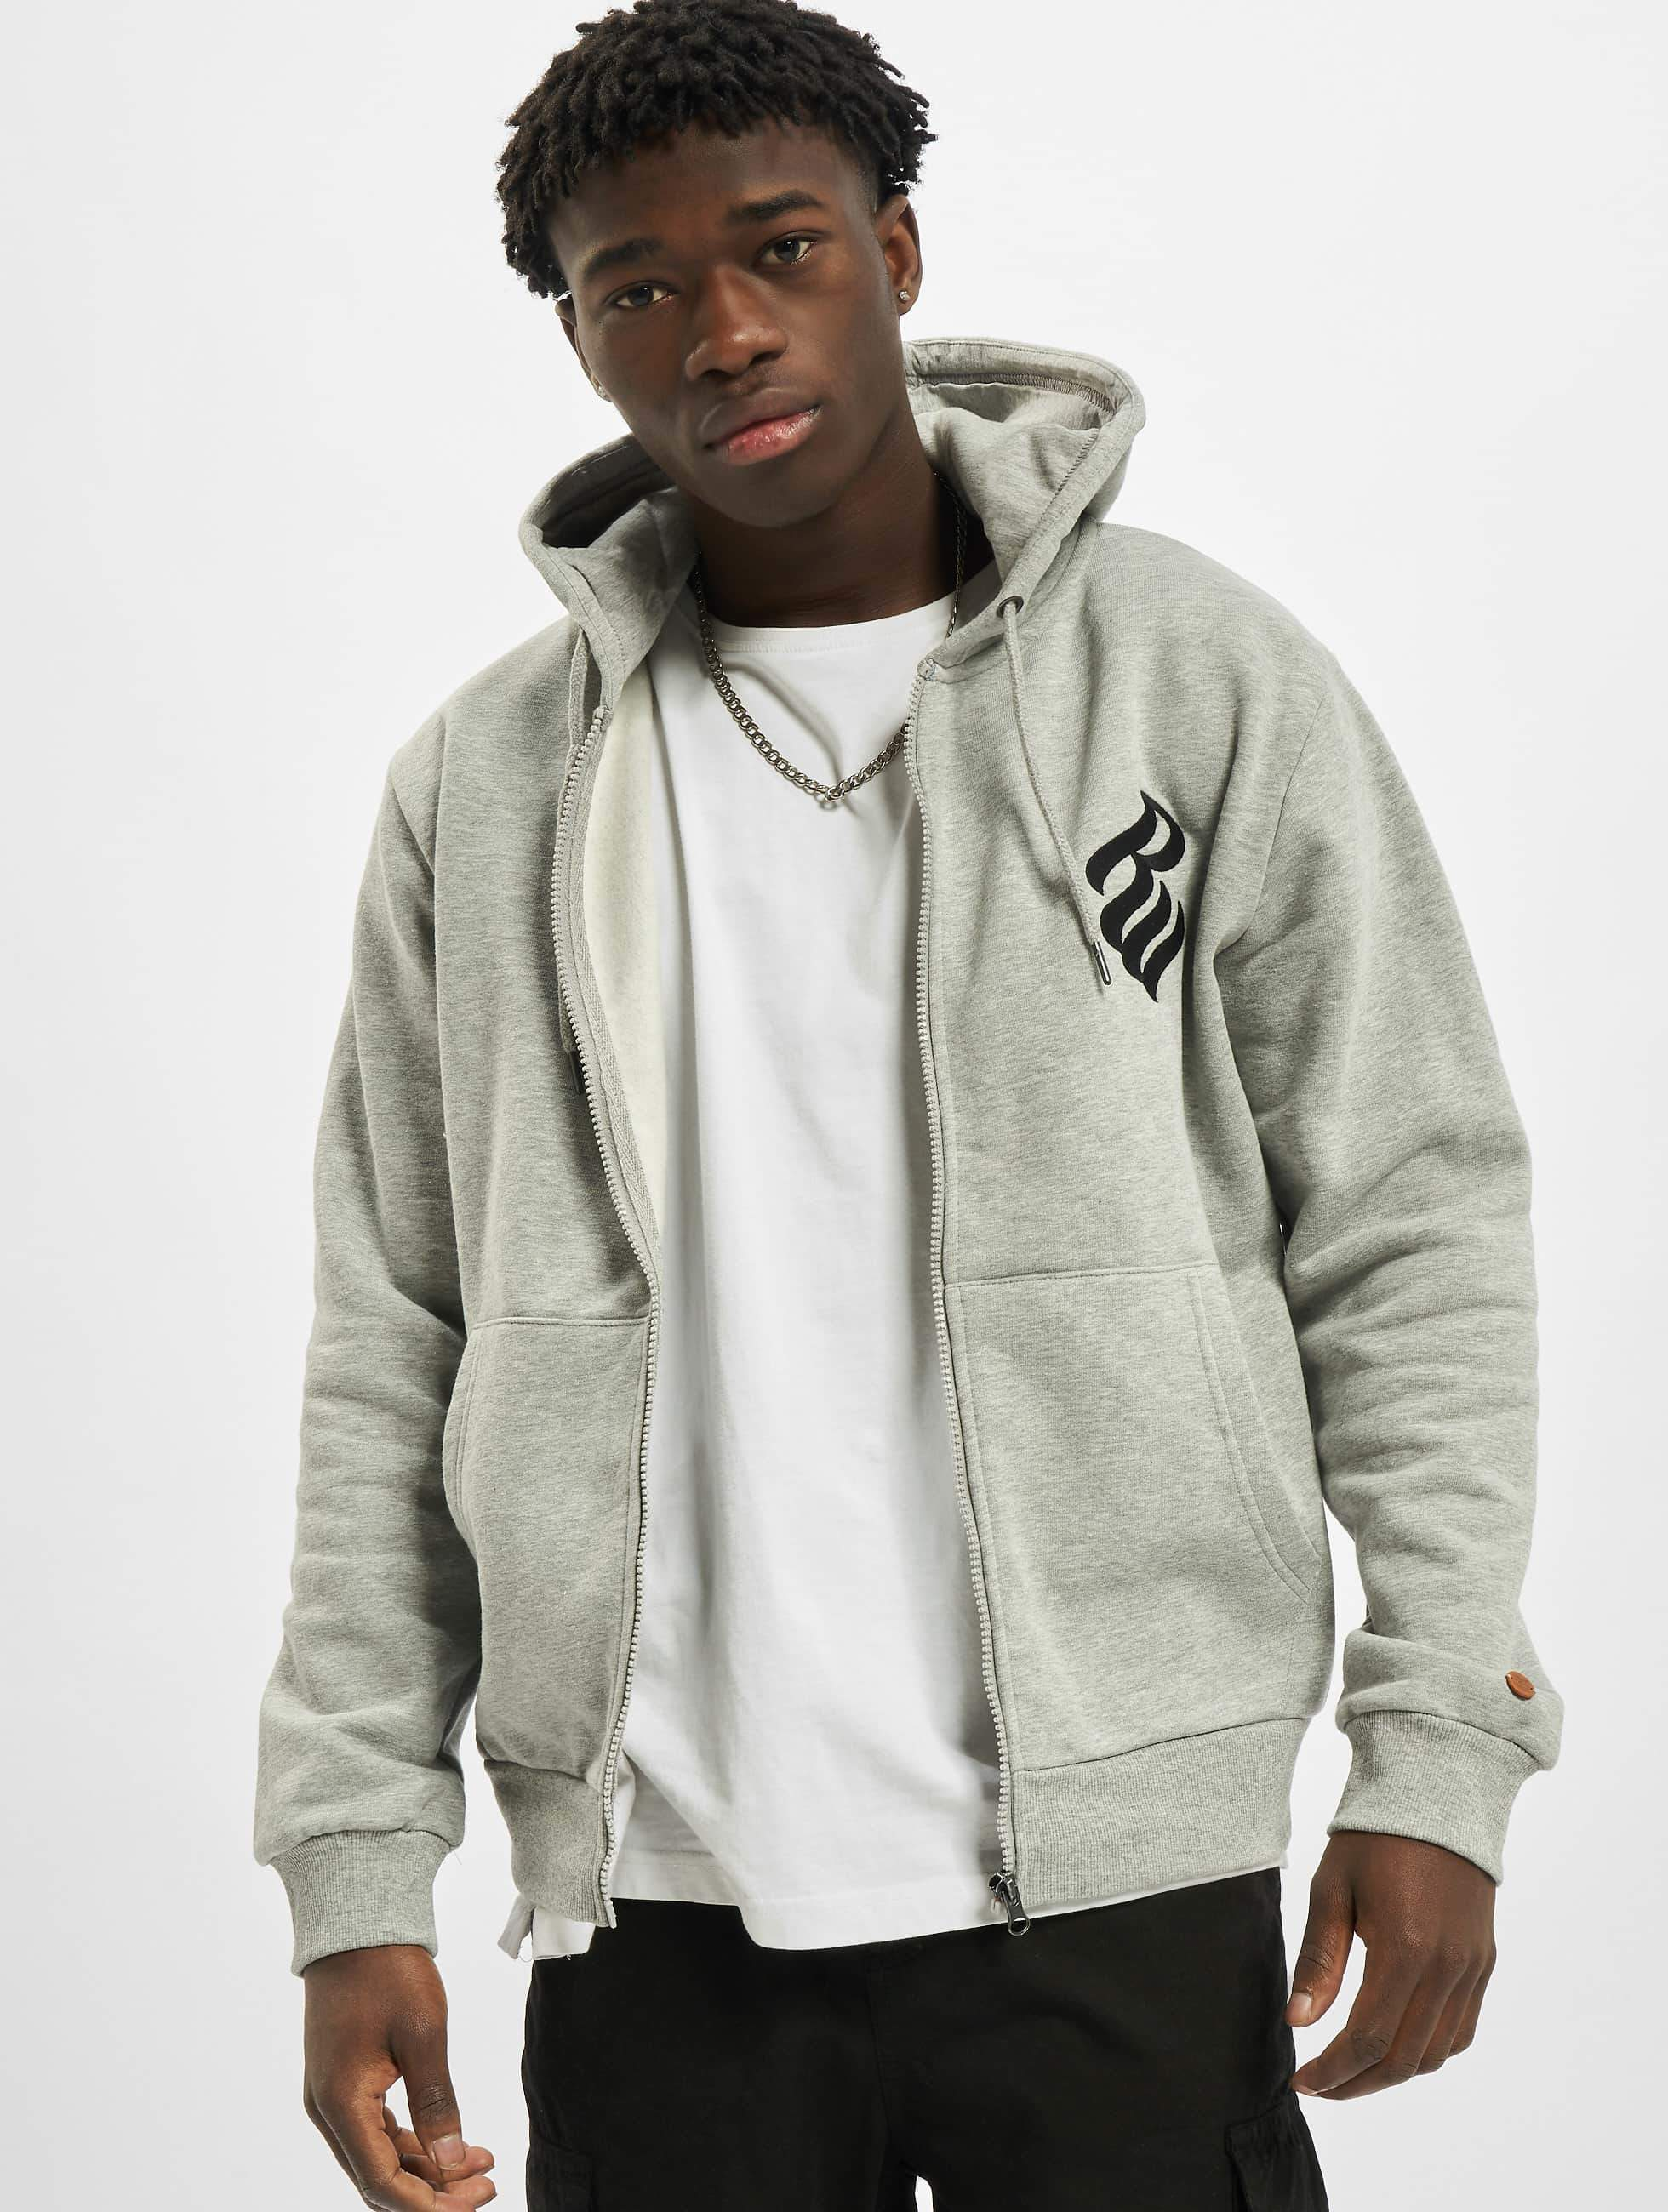 Rocawear / Zip Hoodie Brand in grey XL